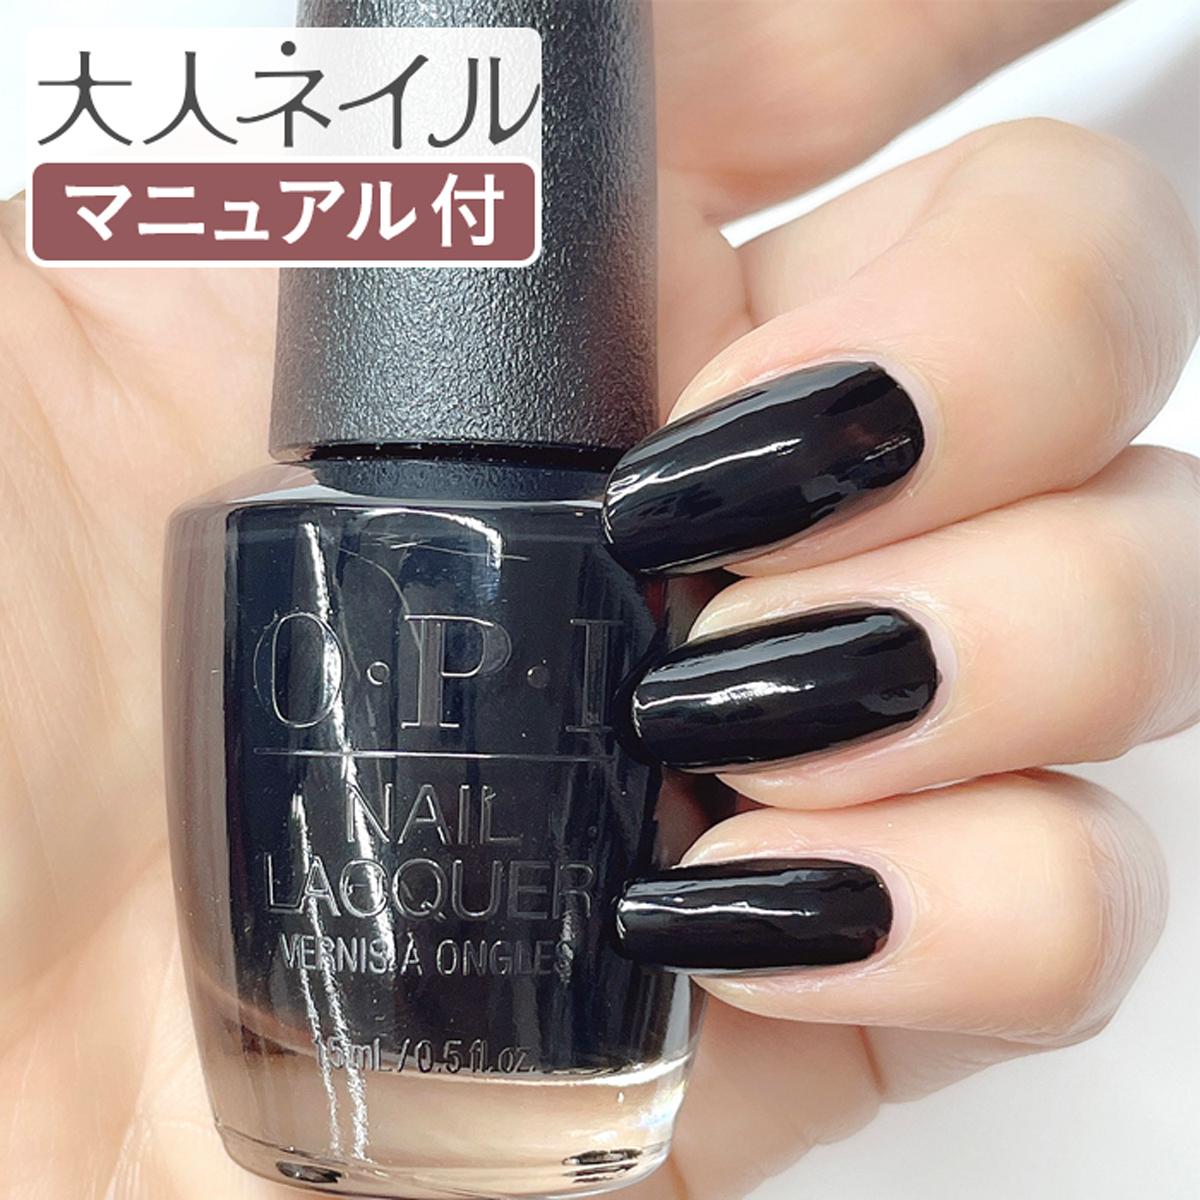 OPI オーピーアイ NL T02 Black Onyx(ブラック・オニックス) ブラック opi ネイル ネイルカラー ネイルポリッシュ マニキュア